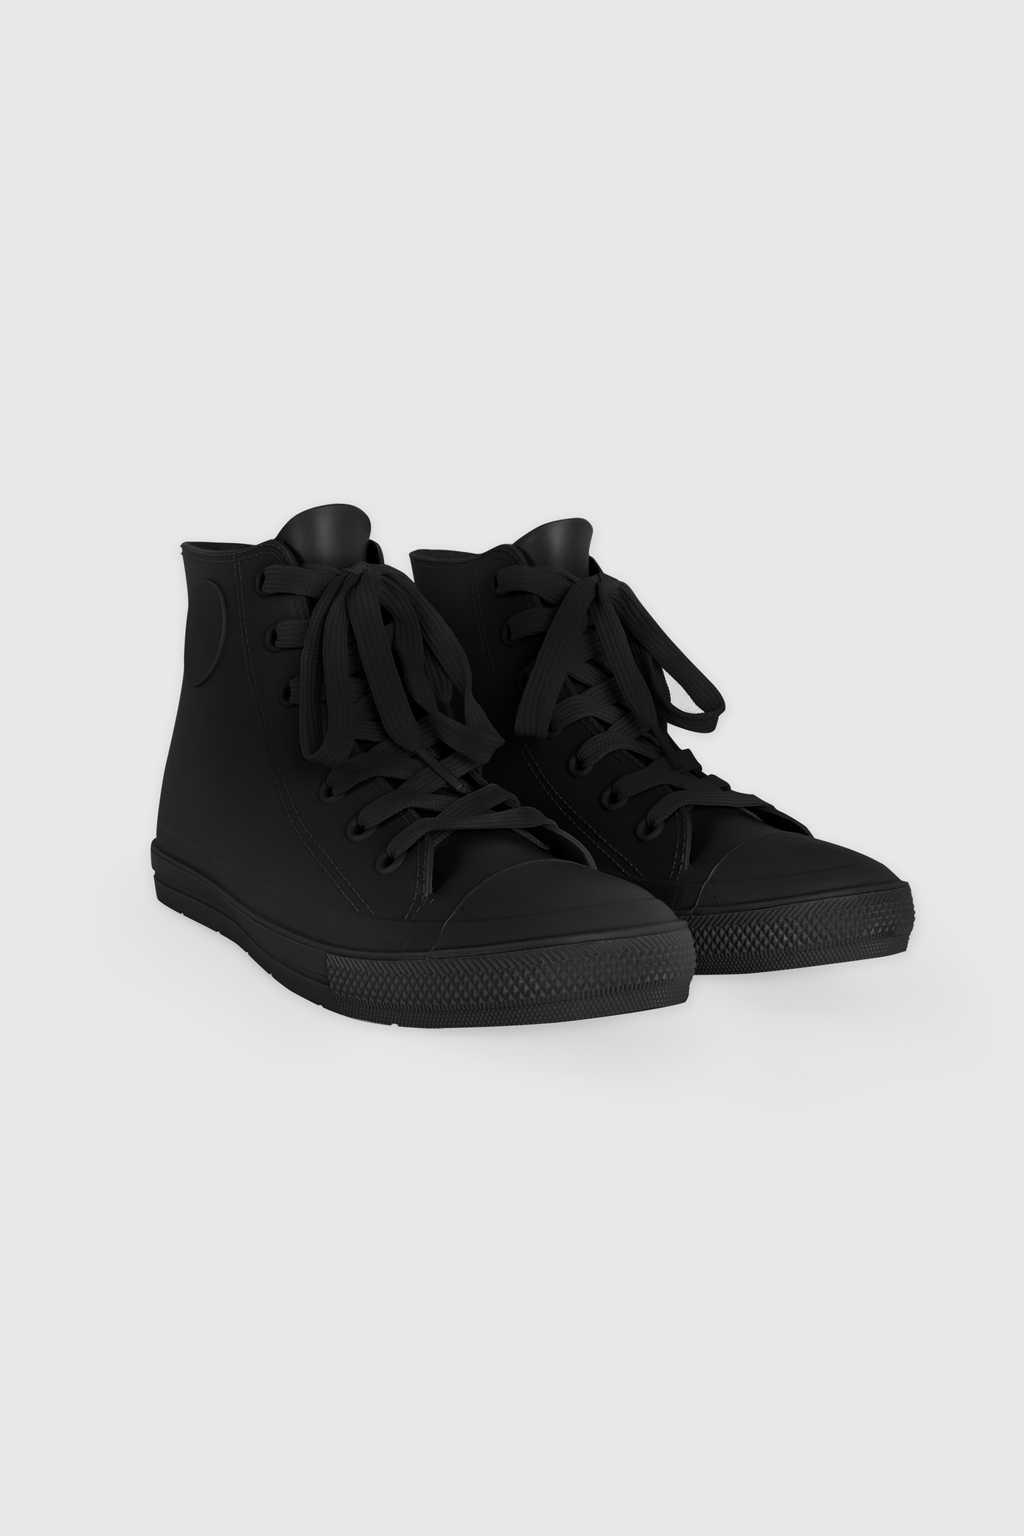 Sneaker 3023 Black 9